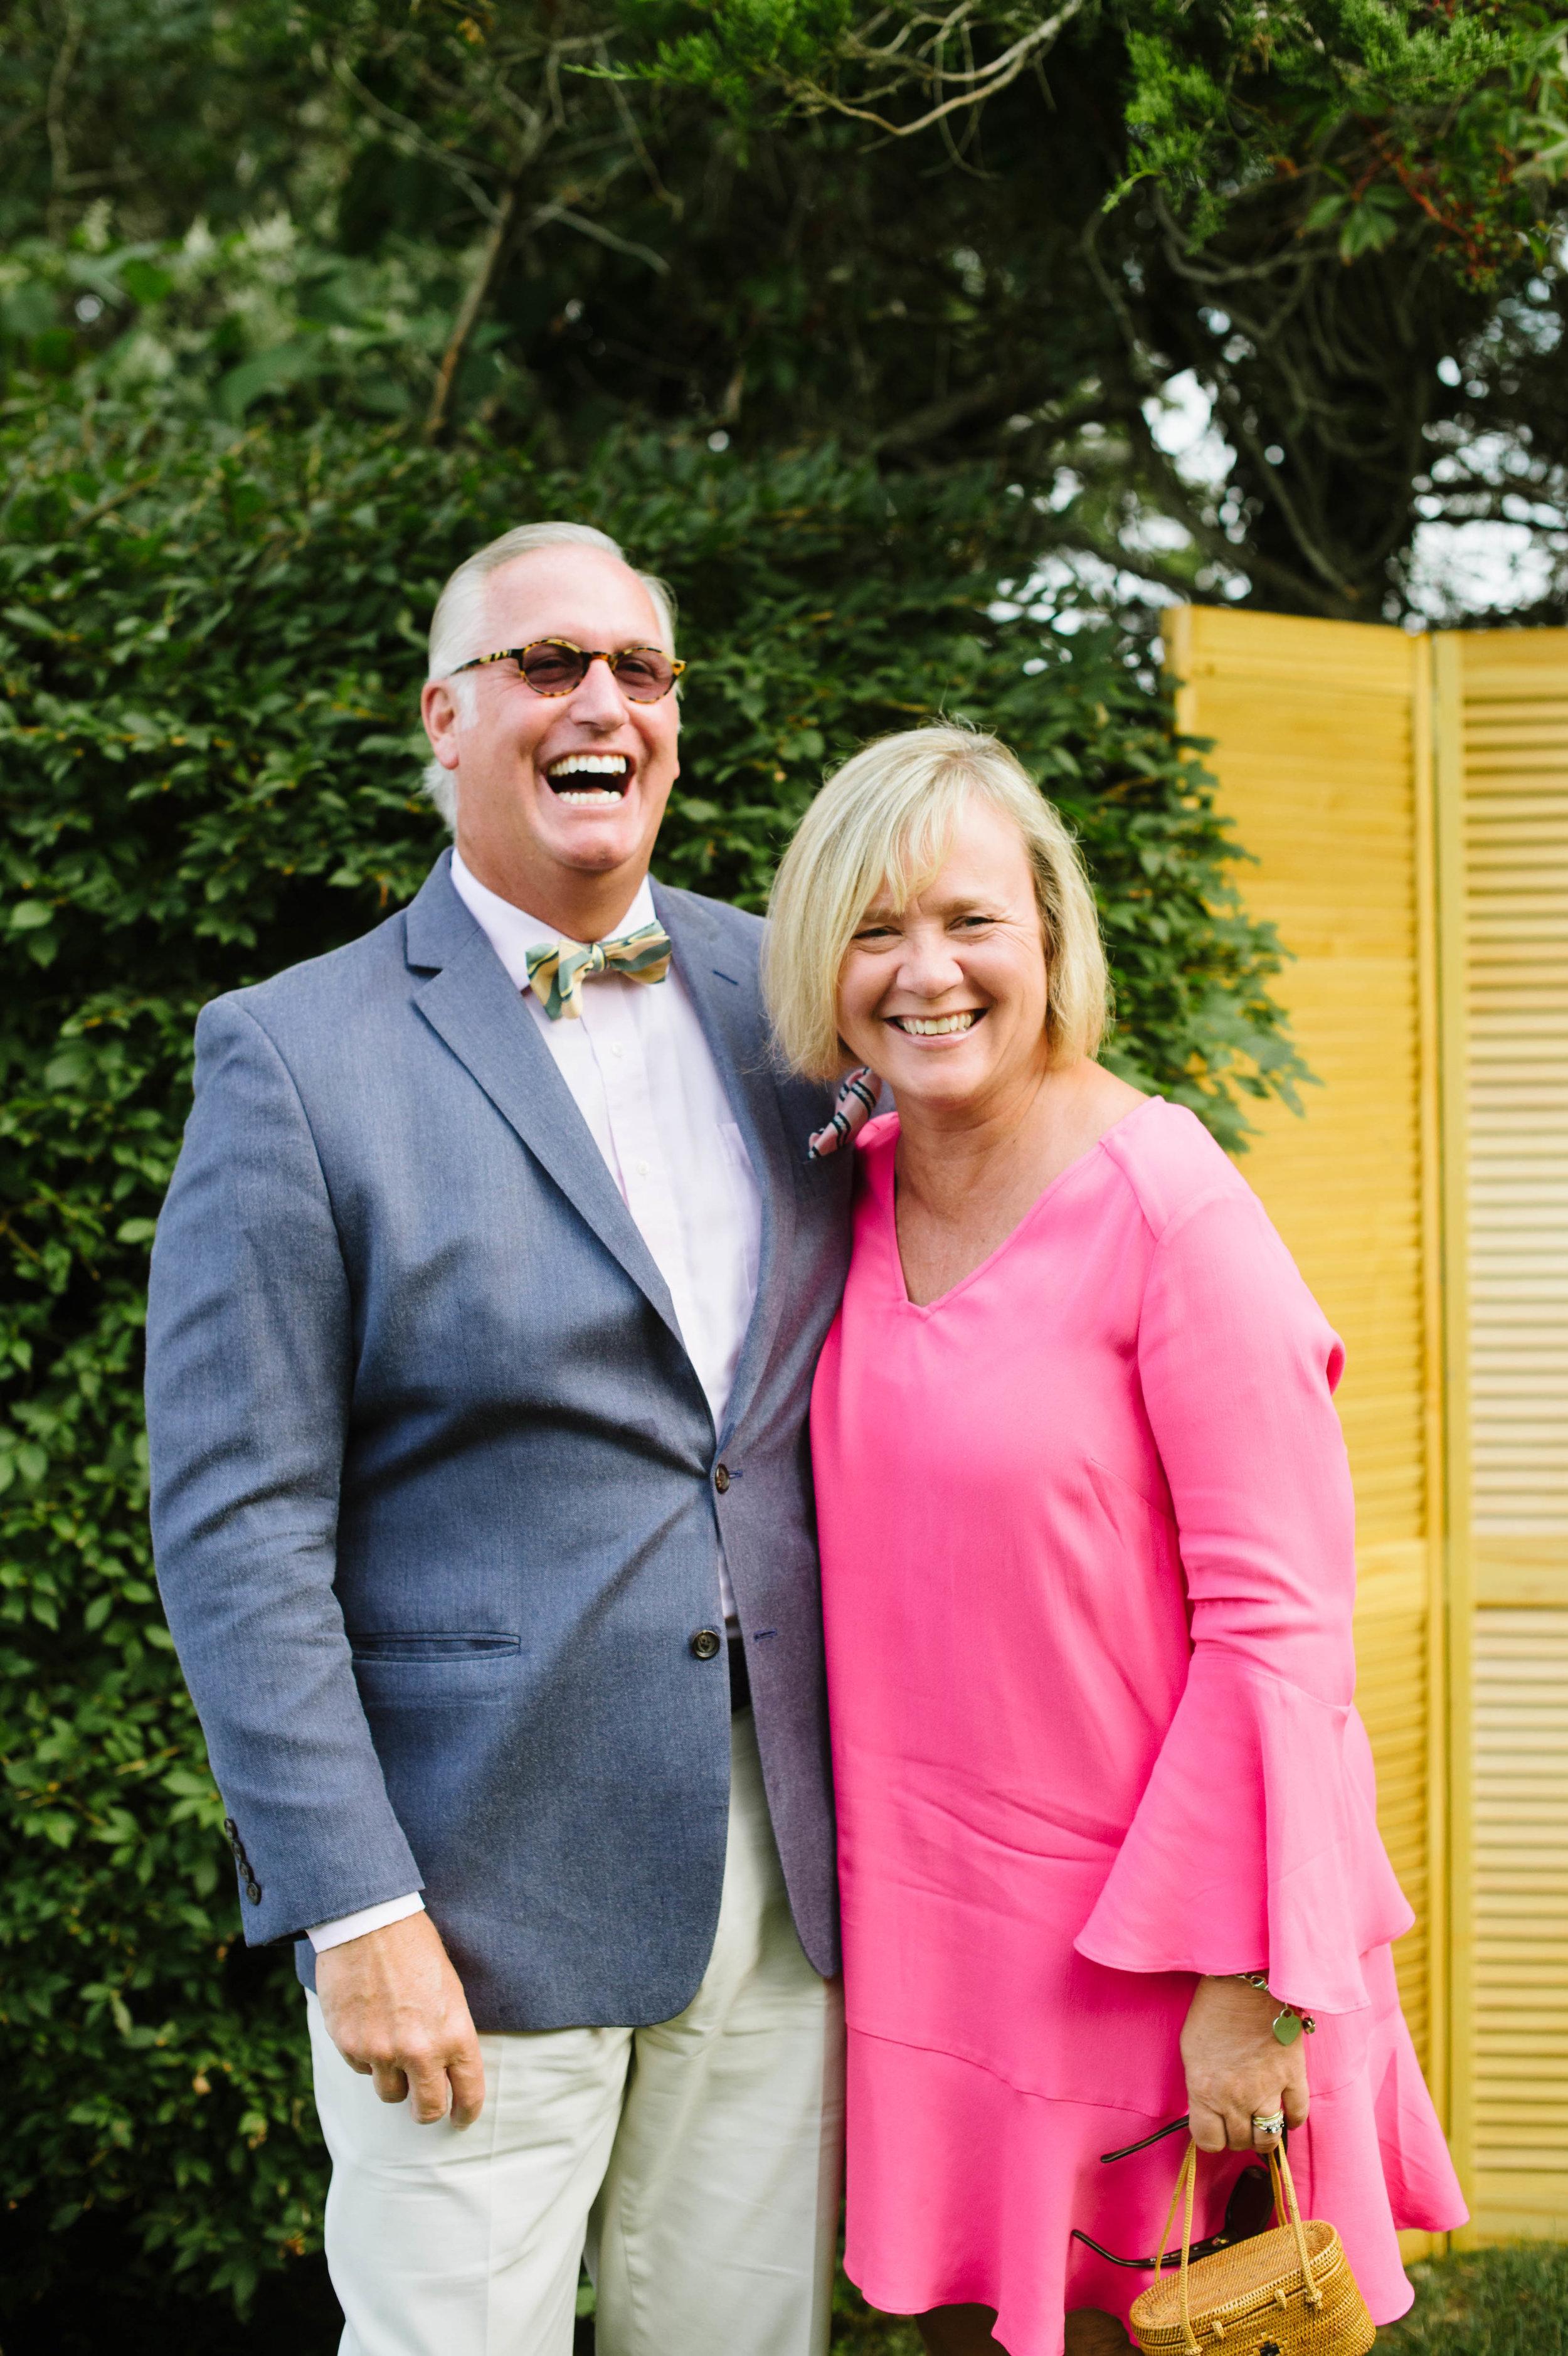 Candid-Wedding-Photography032.jpg